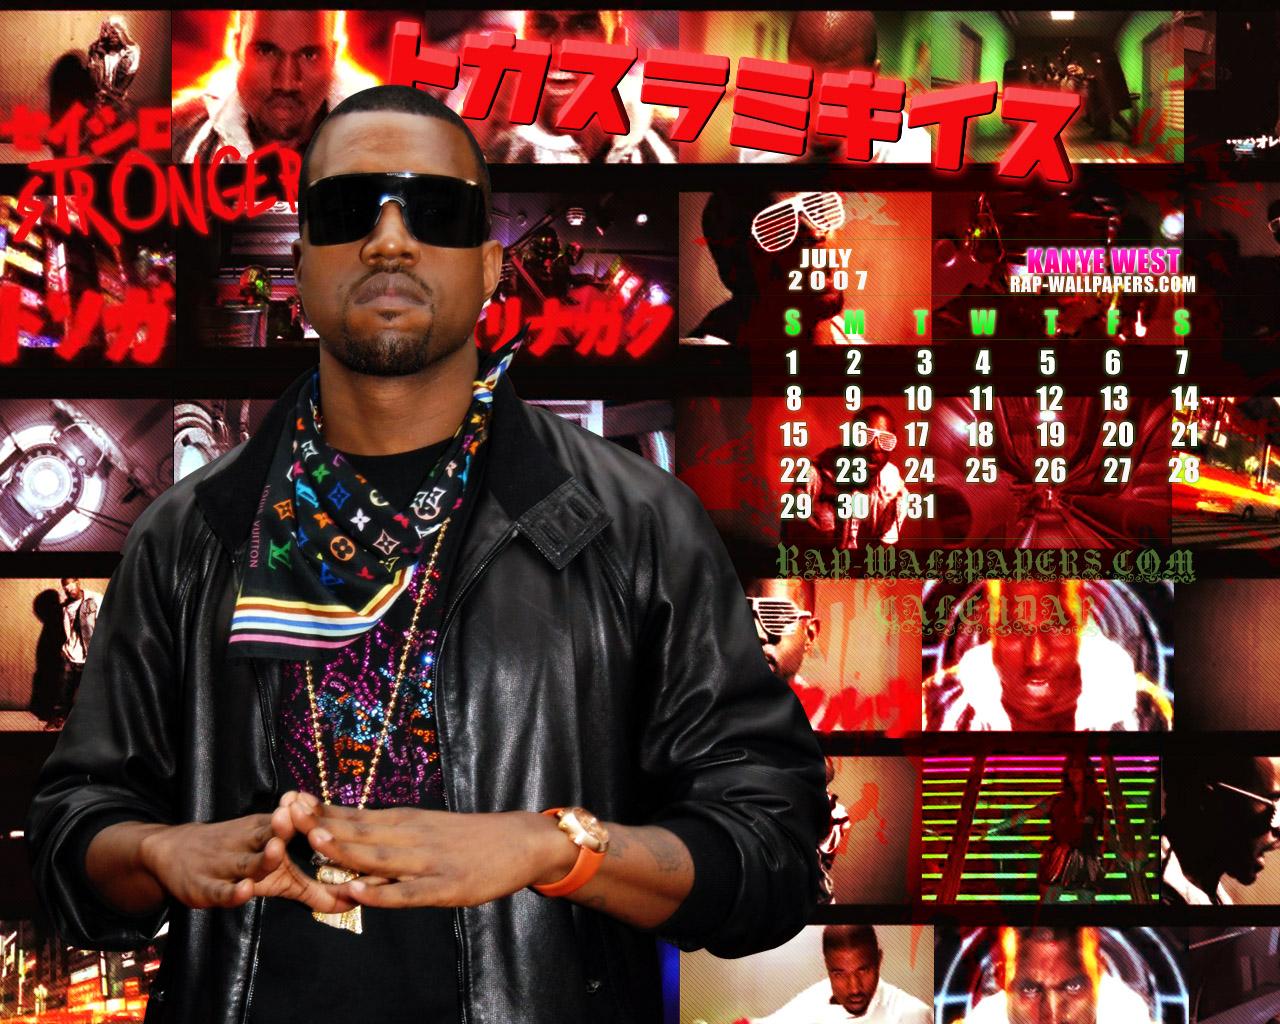 Wallpaper Rapper Eminem HD 44323 ... - hdwallpaperfun.com